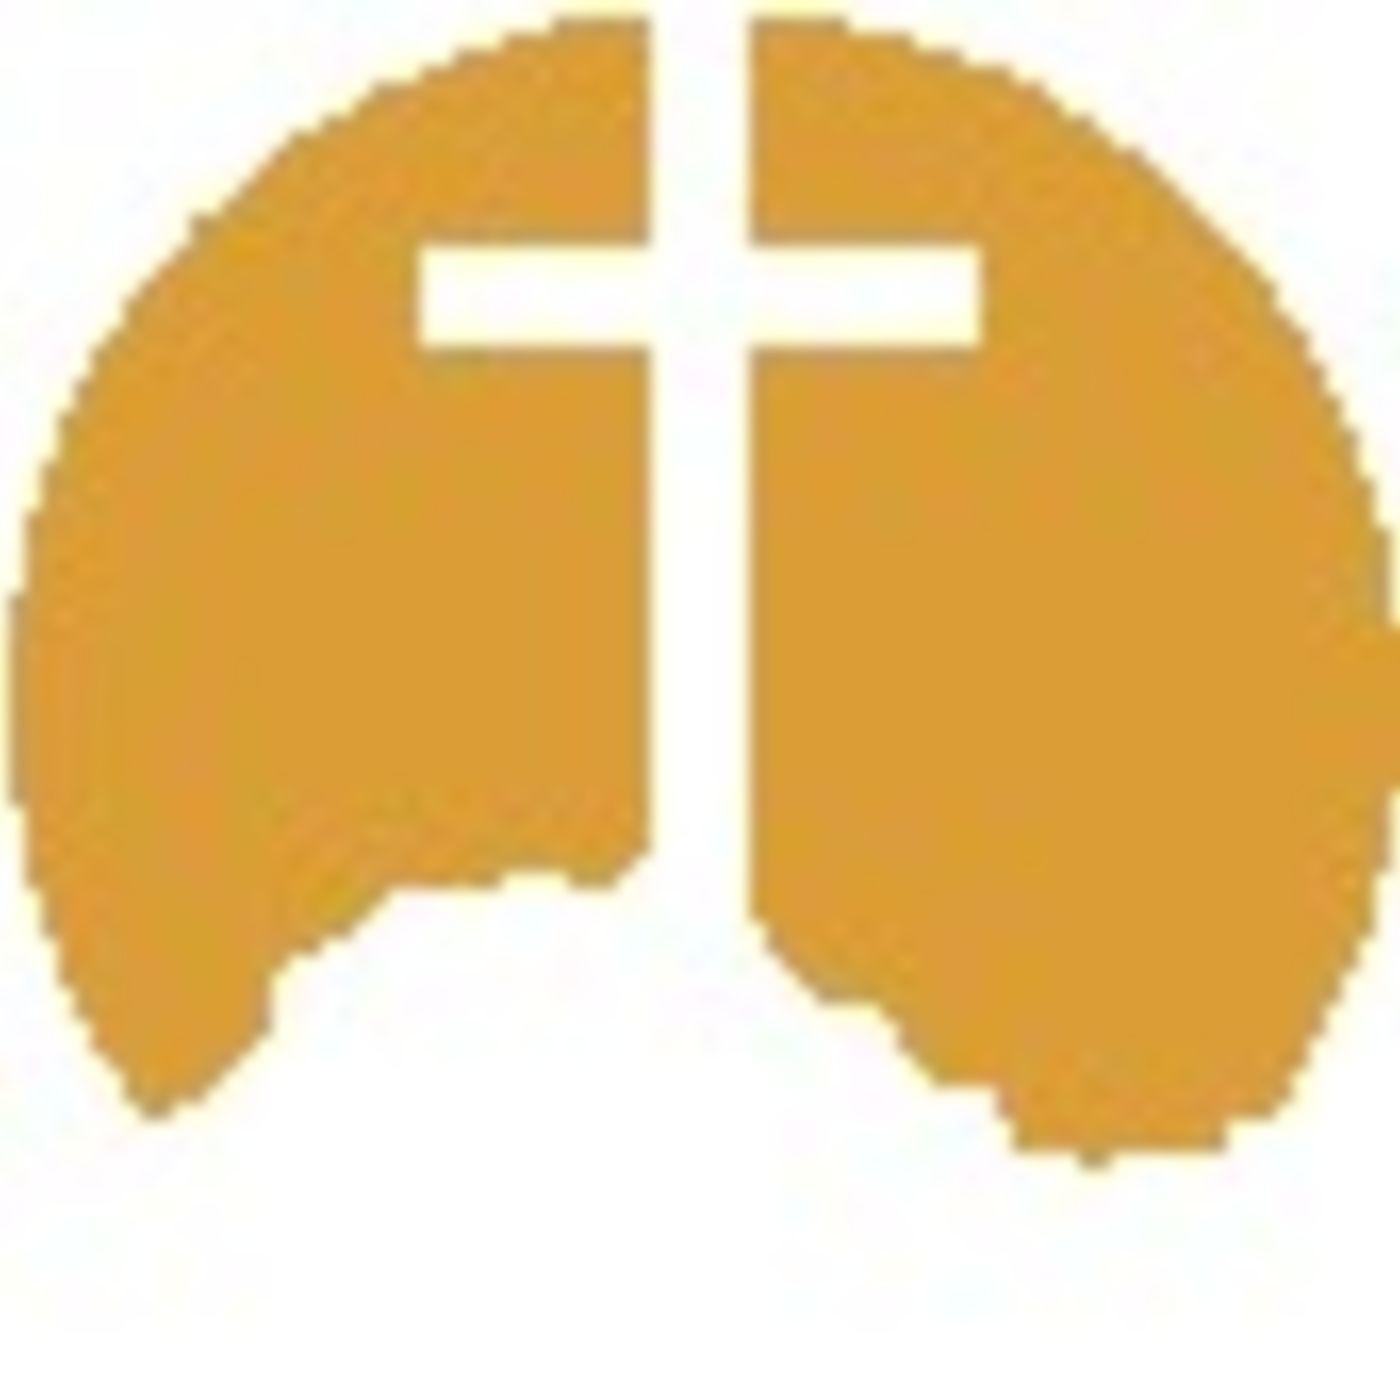 KBC School of Theology - Problem of Evil, Theodicy, Glorifying God